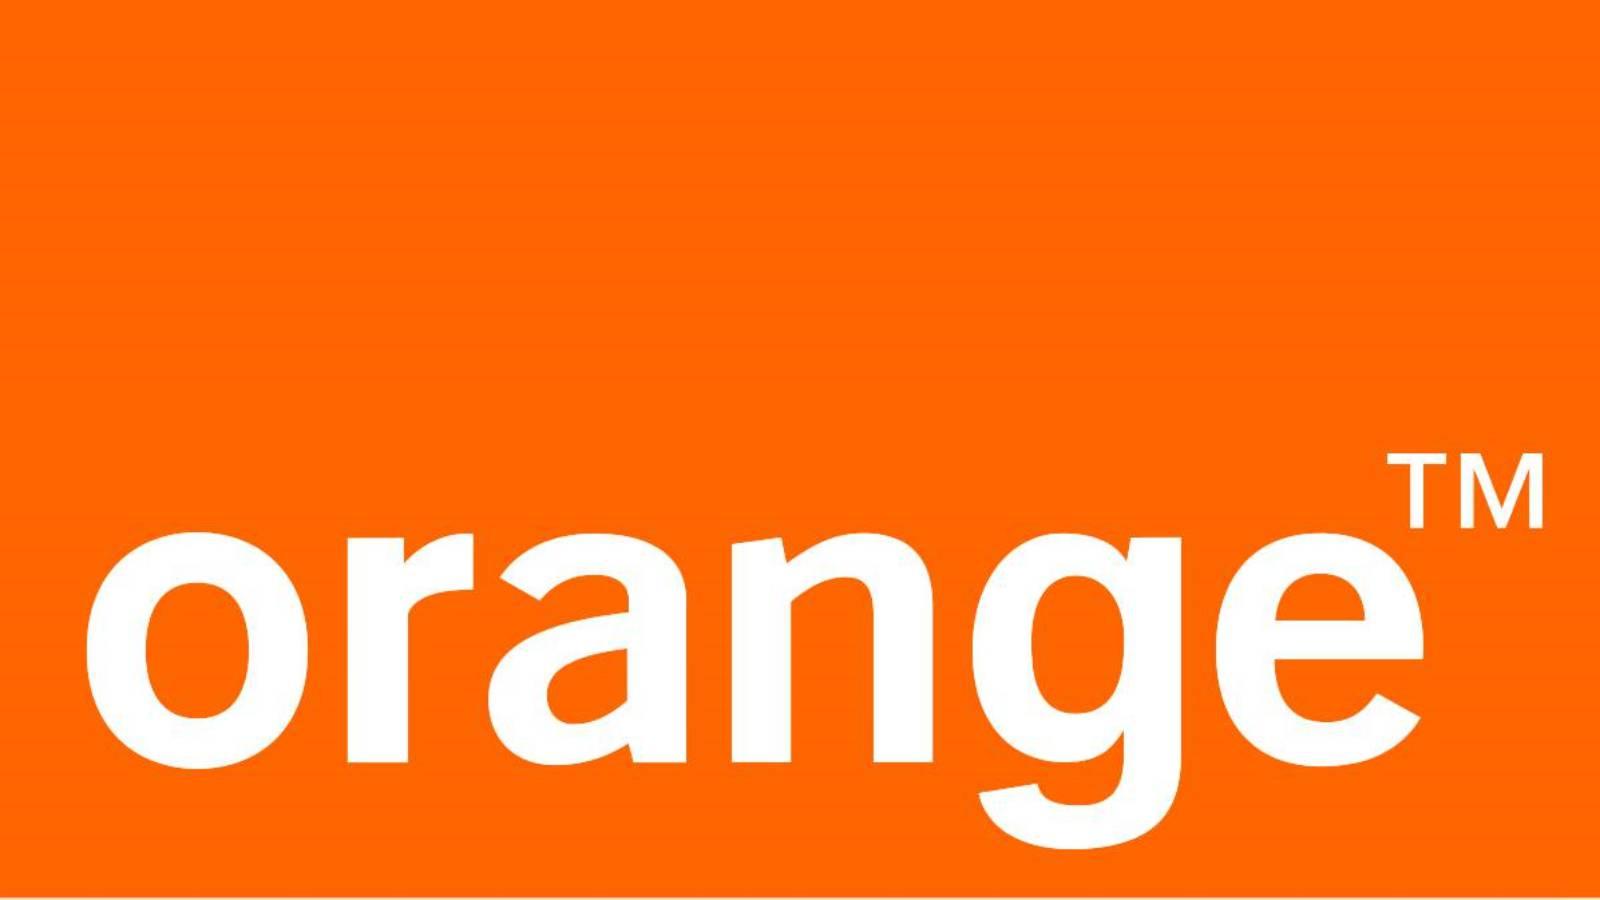 Orange calatorie